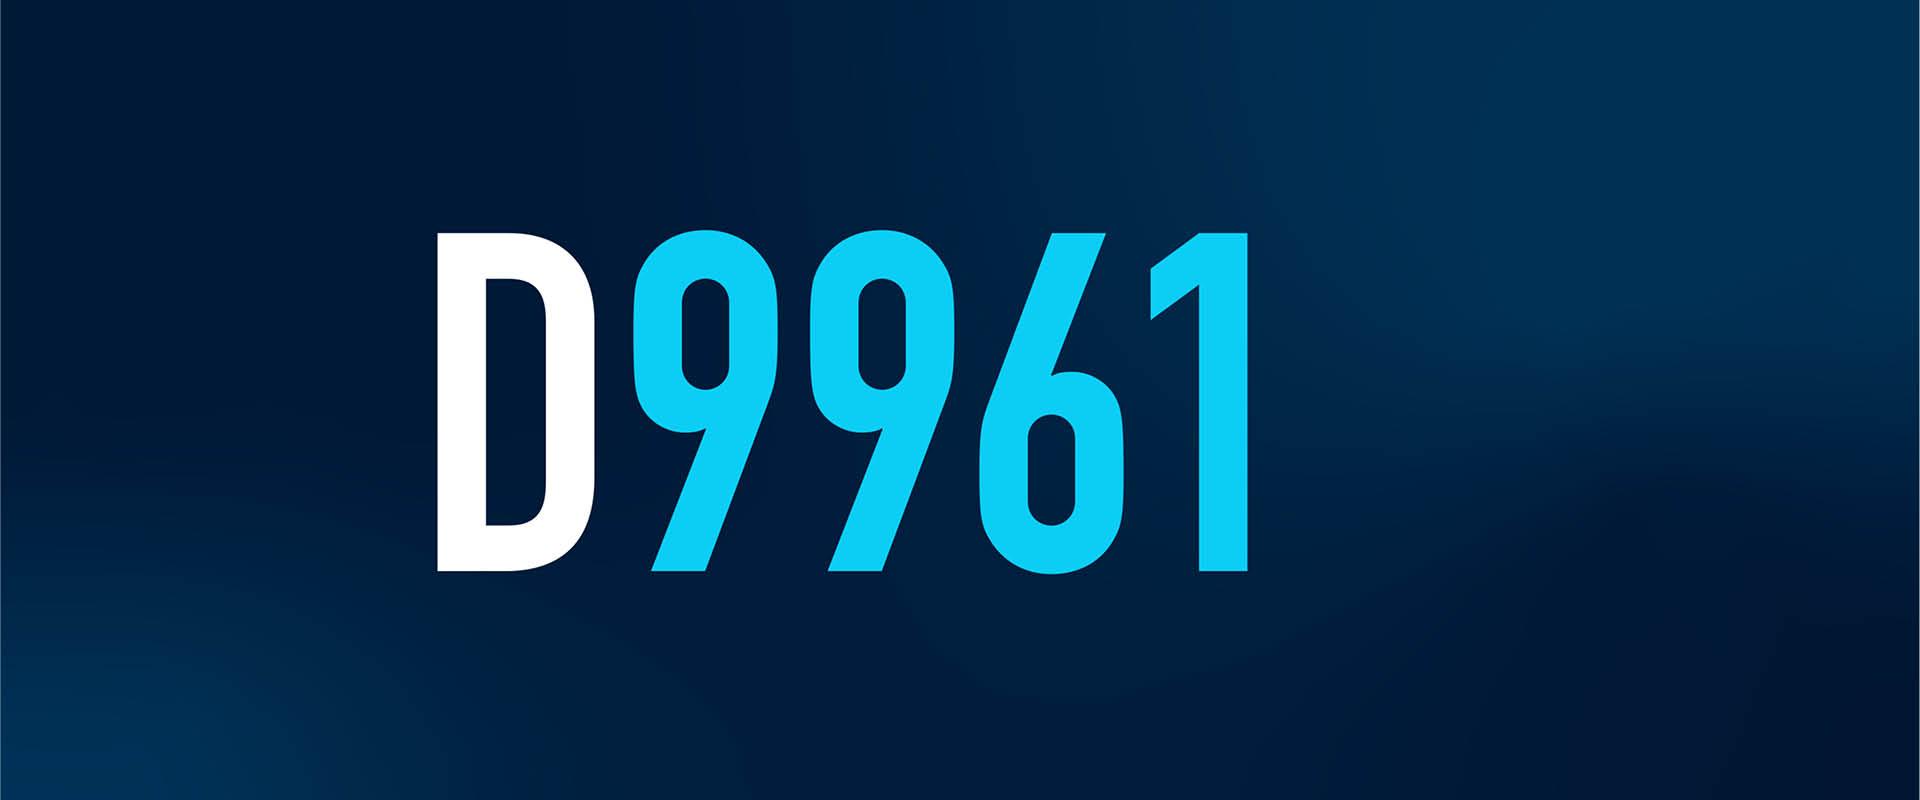 153 D9961